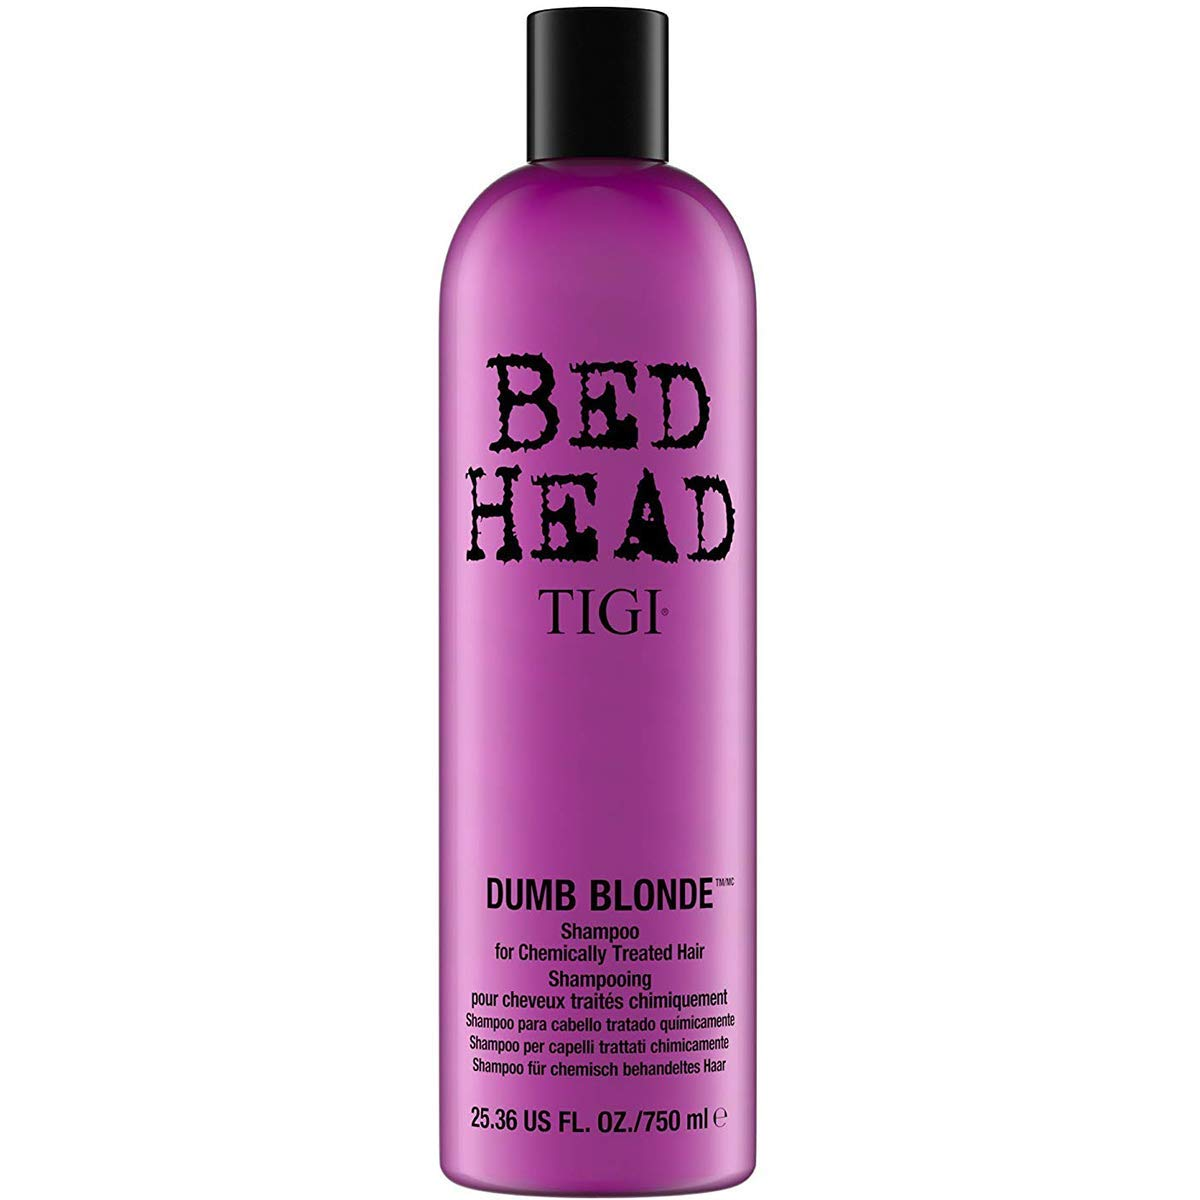 Bed Head by Tigi Dumb Blonde Shampoo for Damaged Blonde Hair 750 ml